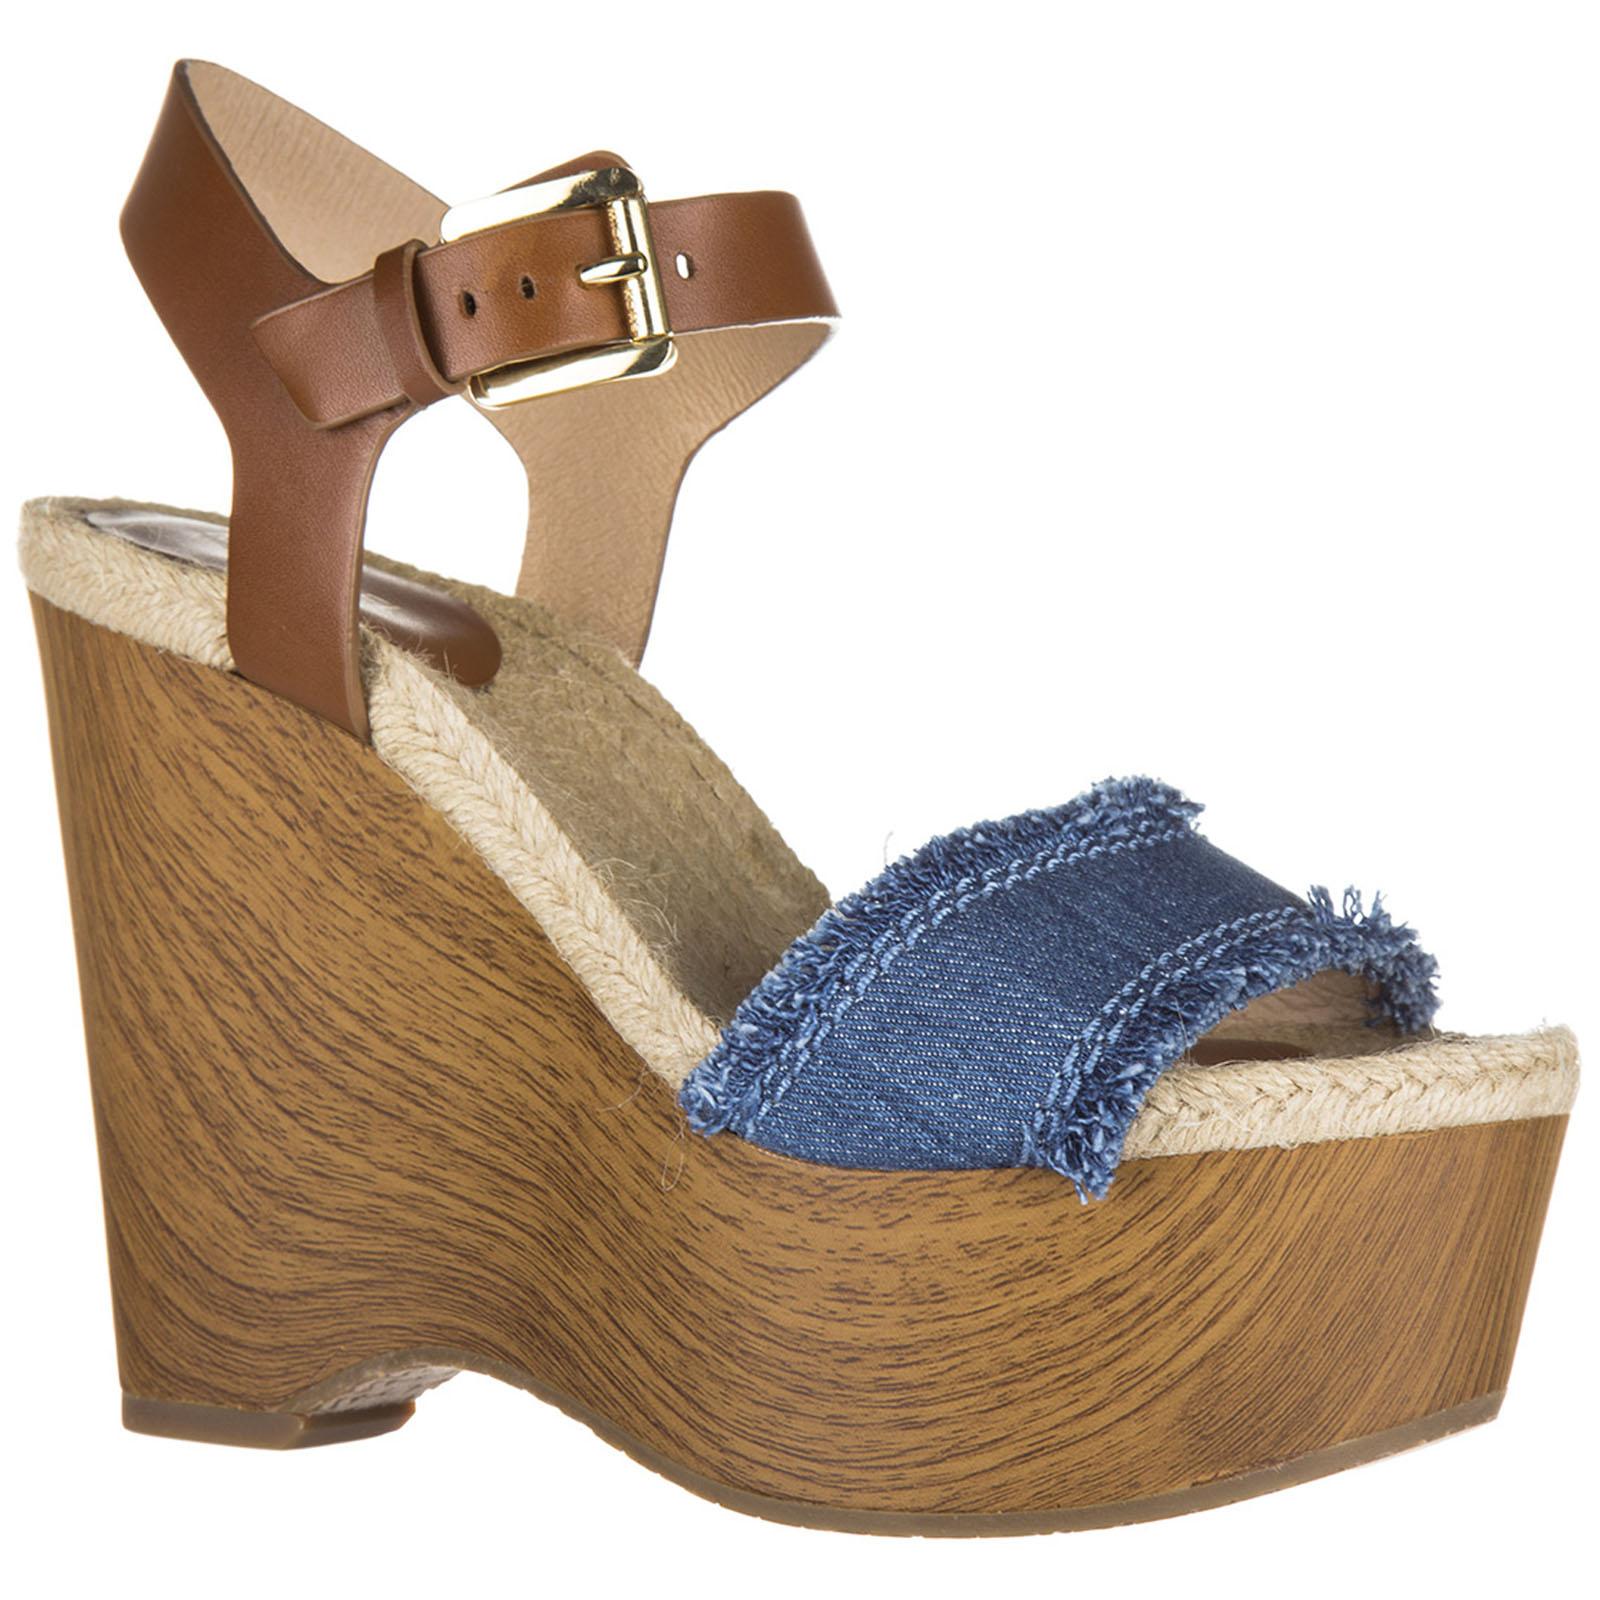 Damenschuhe sandals keilabsatz leder wedges leni